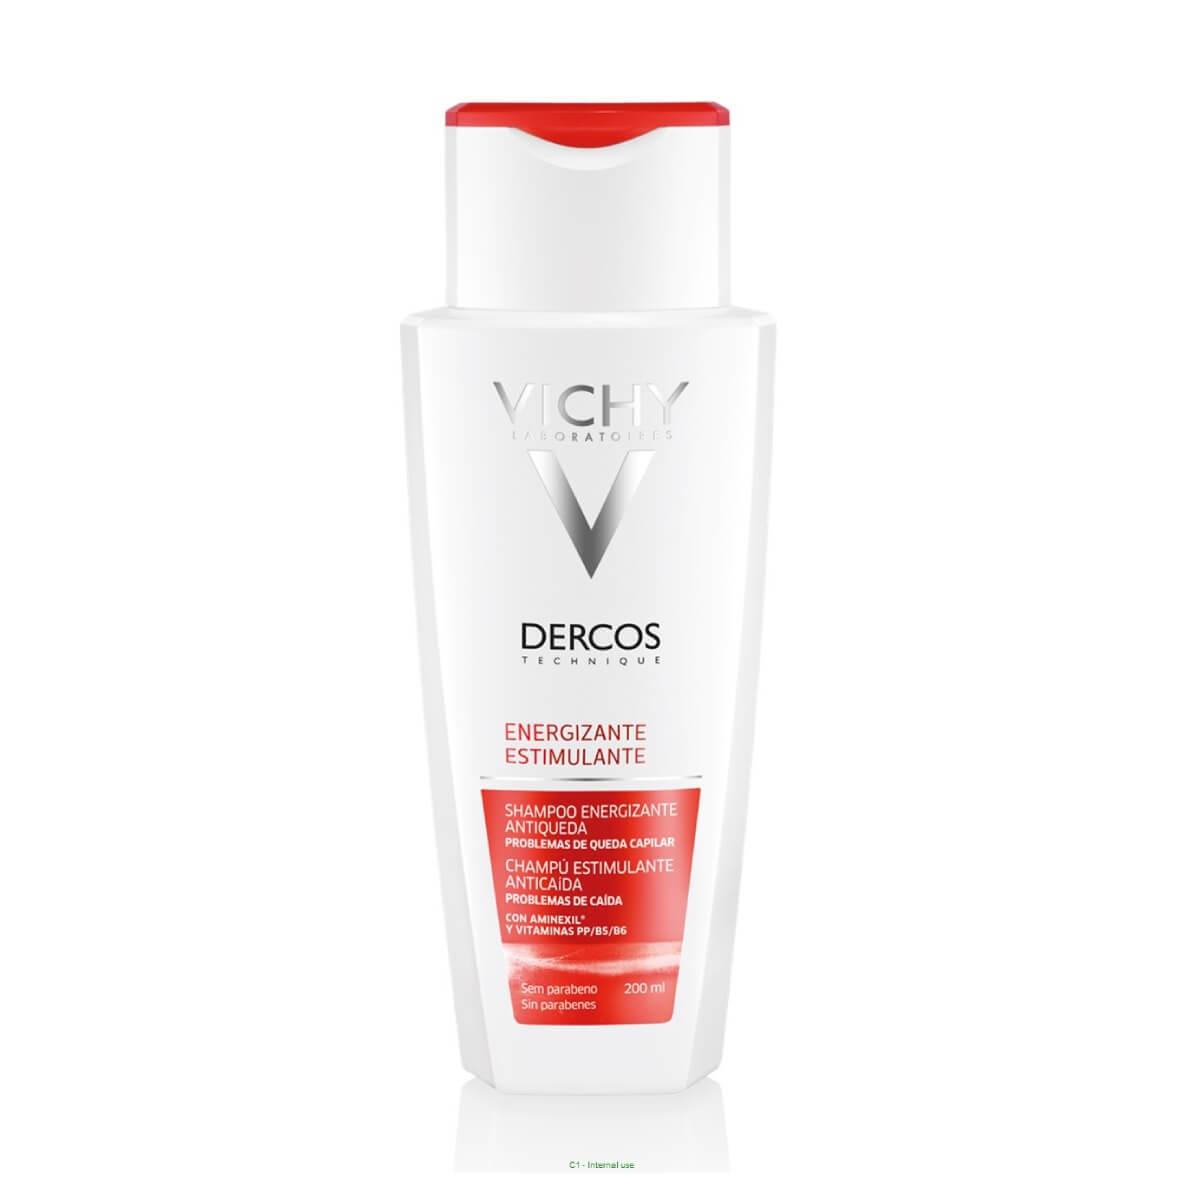 Shampoo Antiqueda Vichy Dercos Energizante com 200ml 200ml